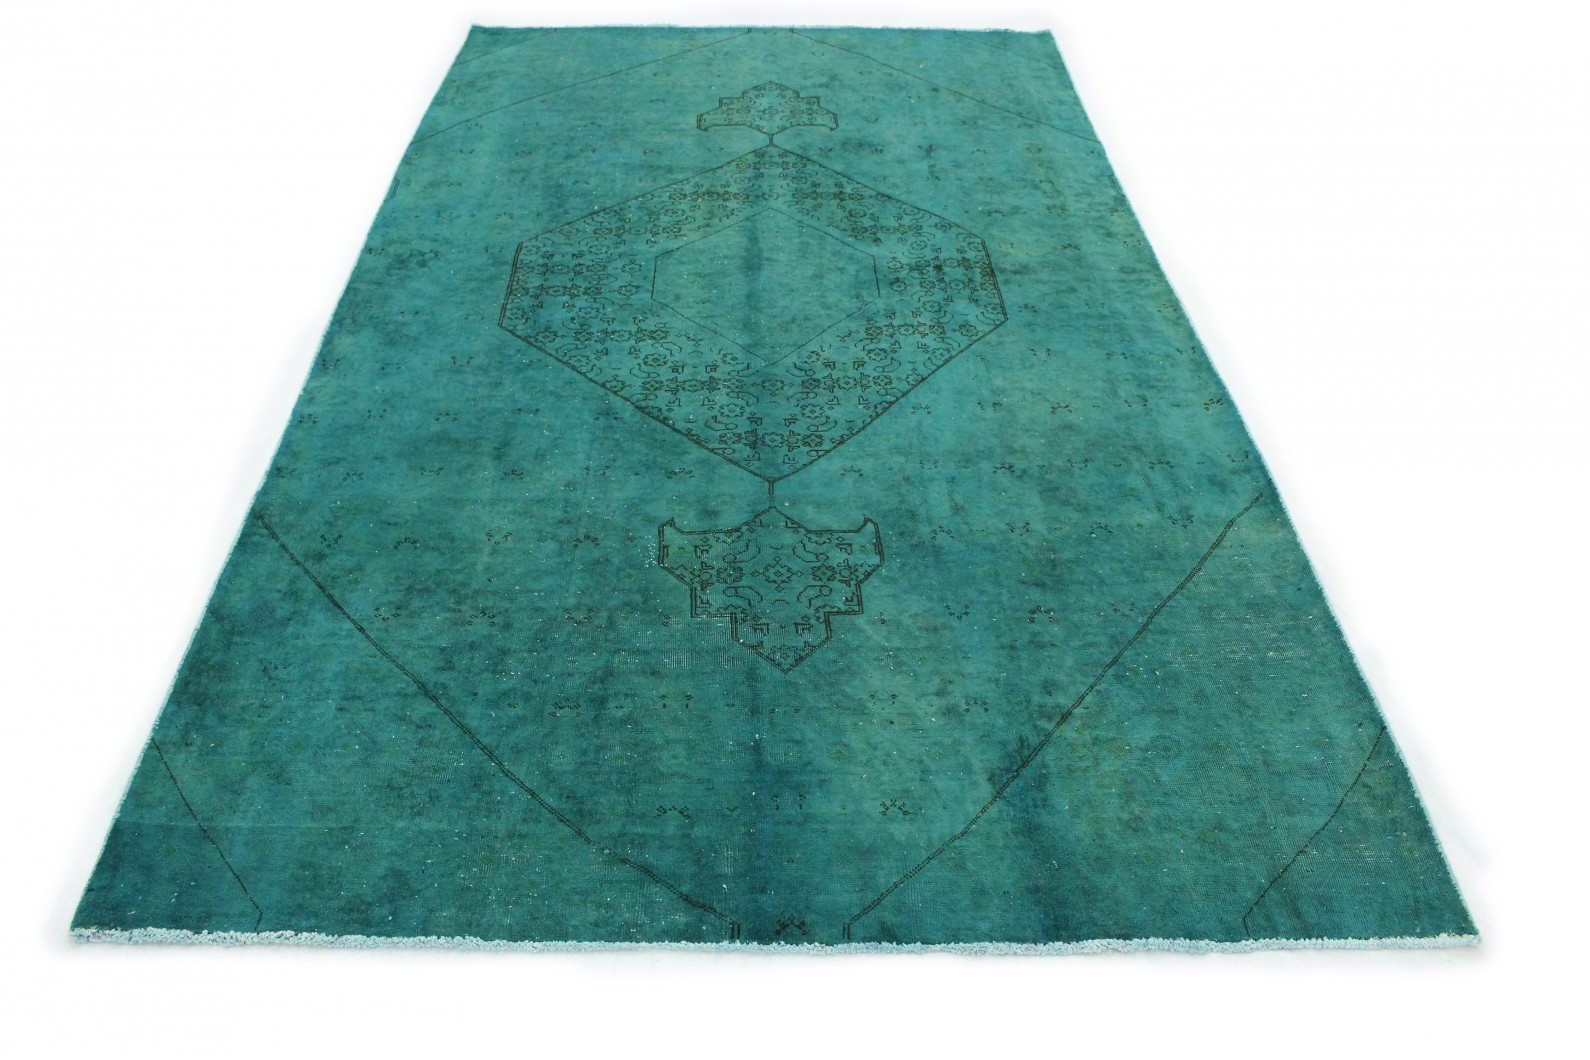 vintage teppich t rkis in 320x180 1001 177264 bei kaufen. Black Bedroom Furniture Sets. Home Design Ideas